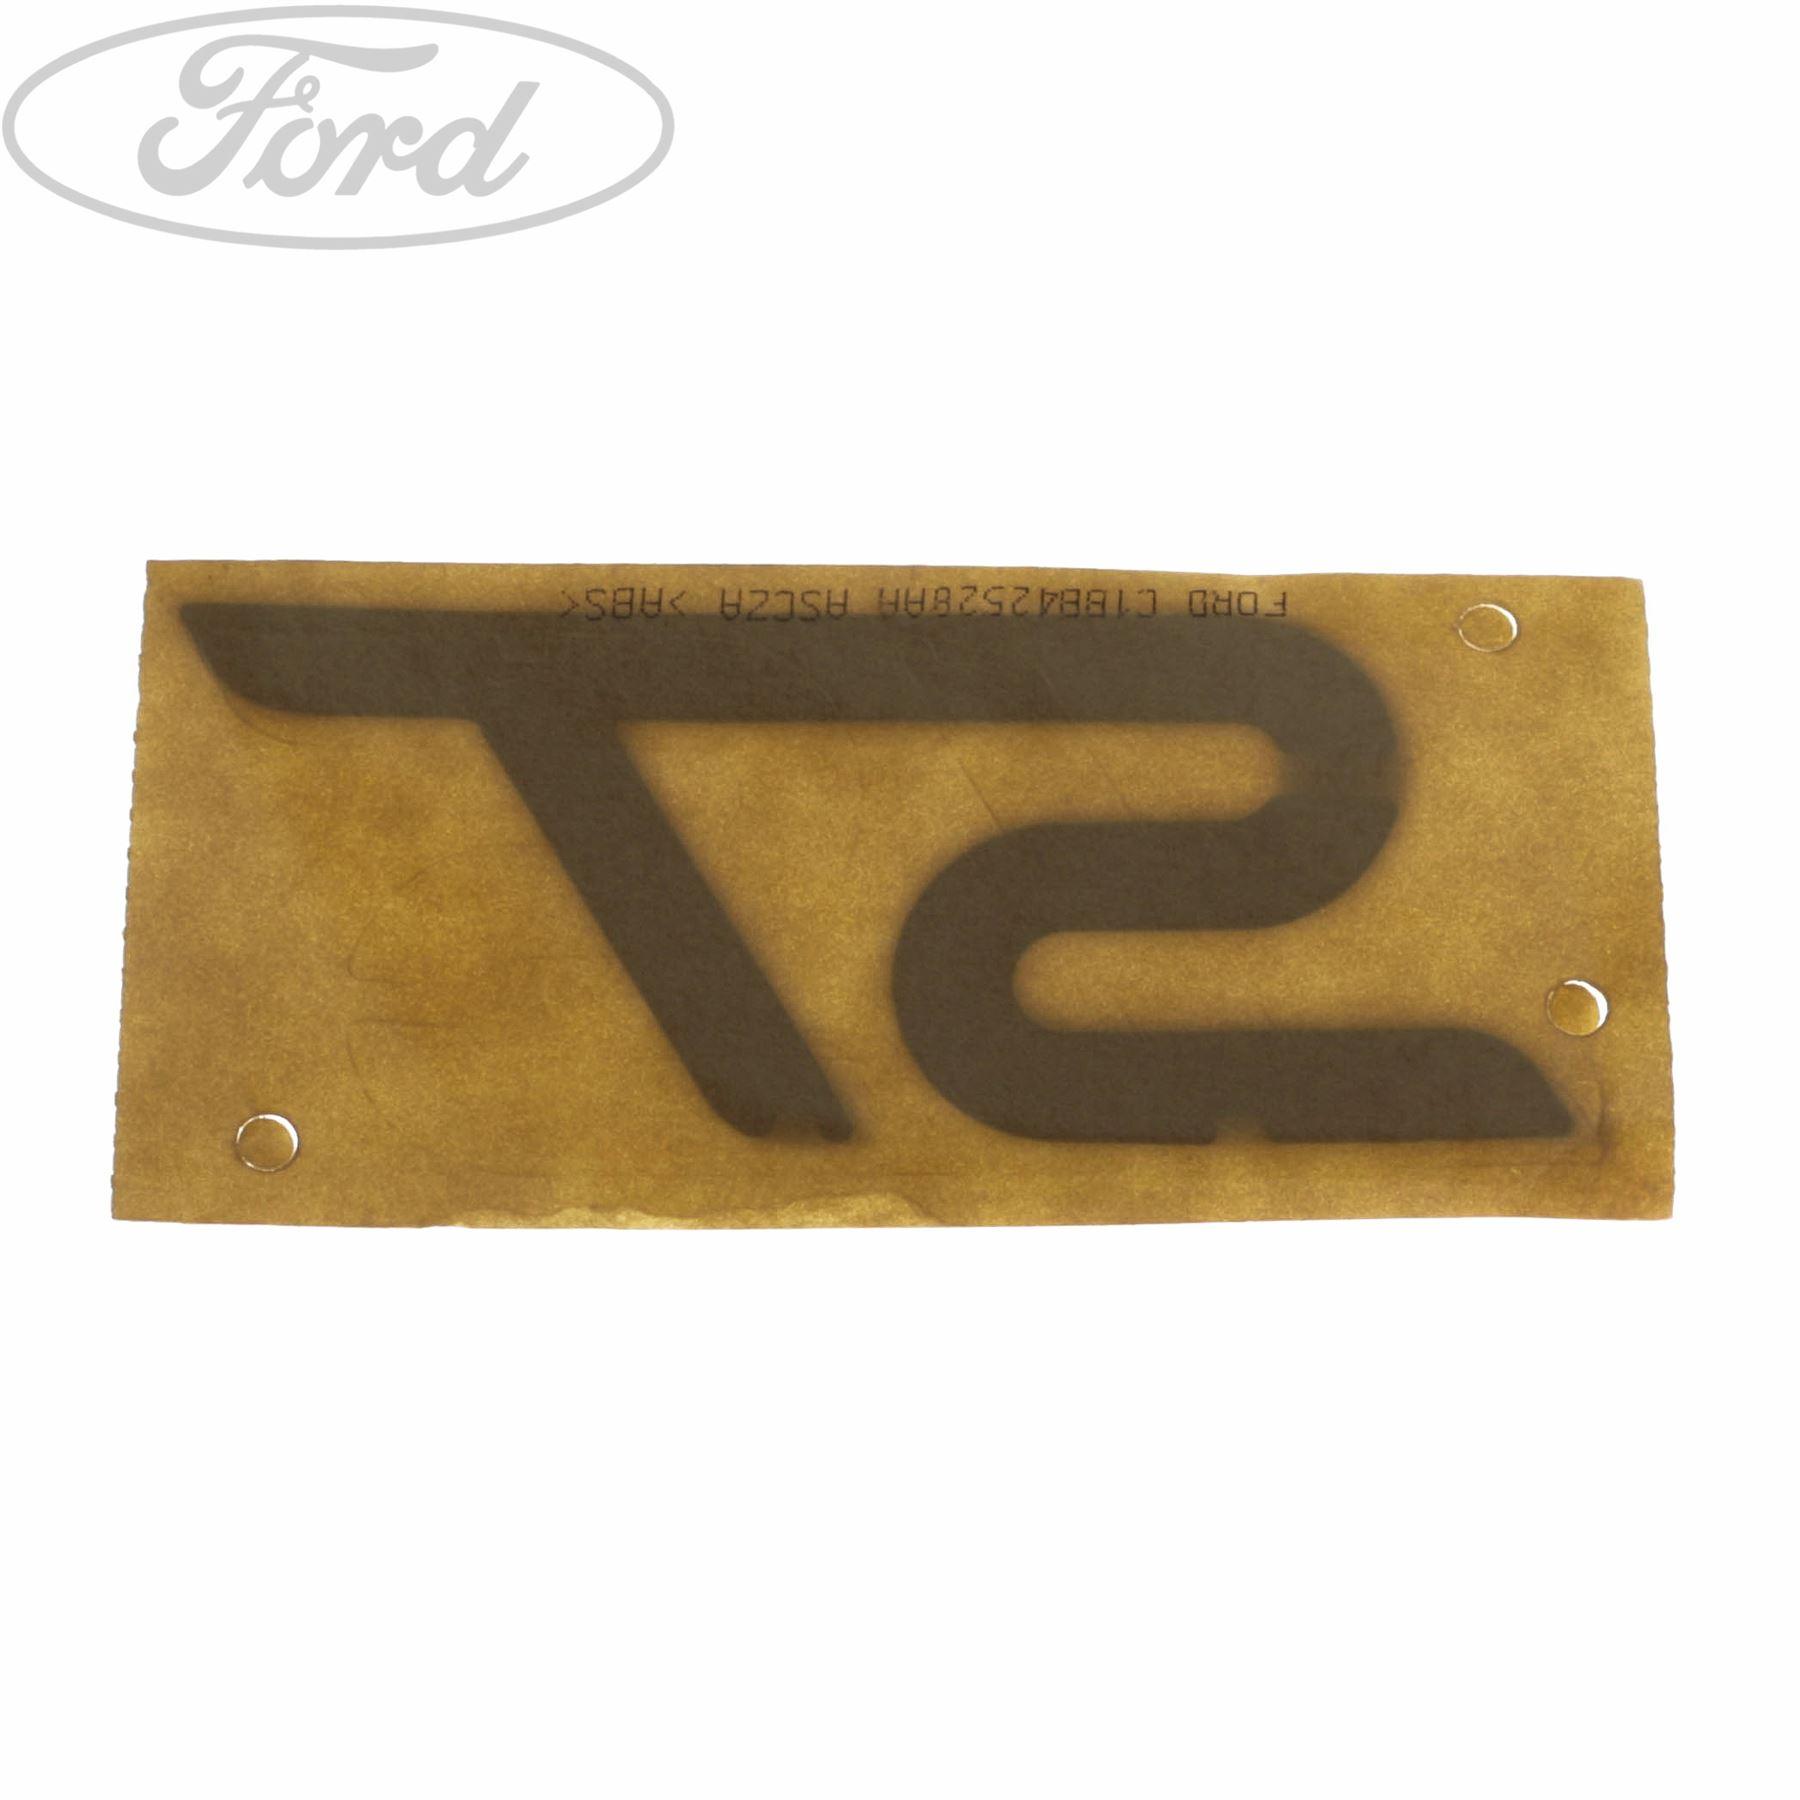 Genuine Ford Fiesta MK7 ST Tailgate Name Plate Badge Emblem 1794608